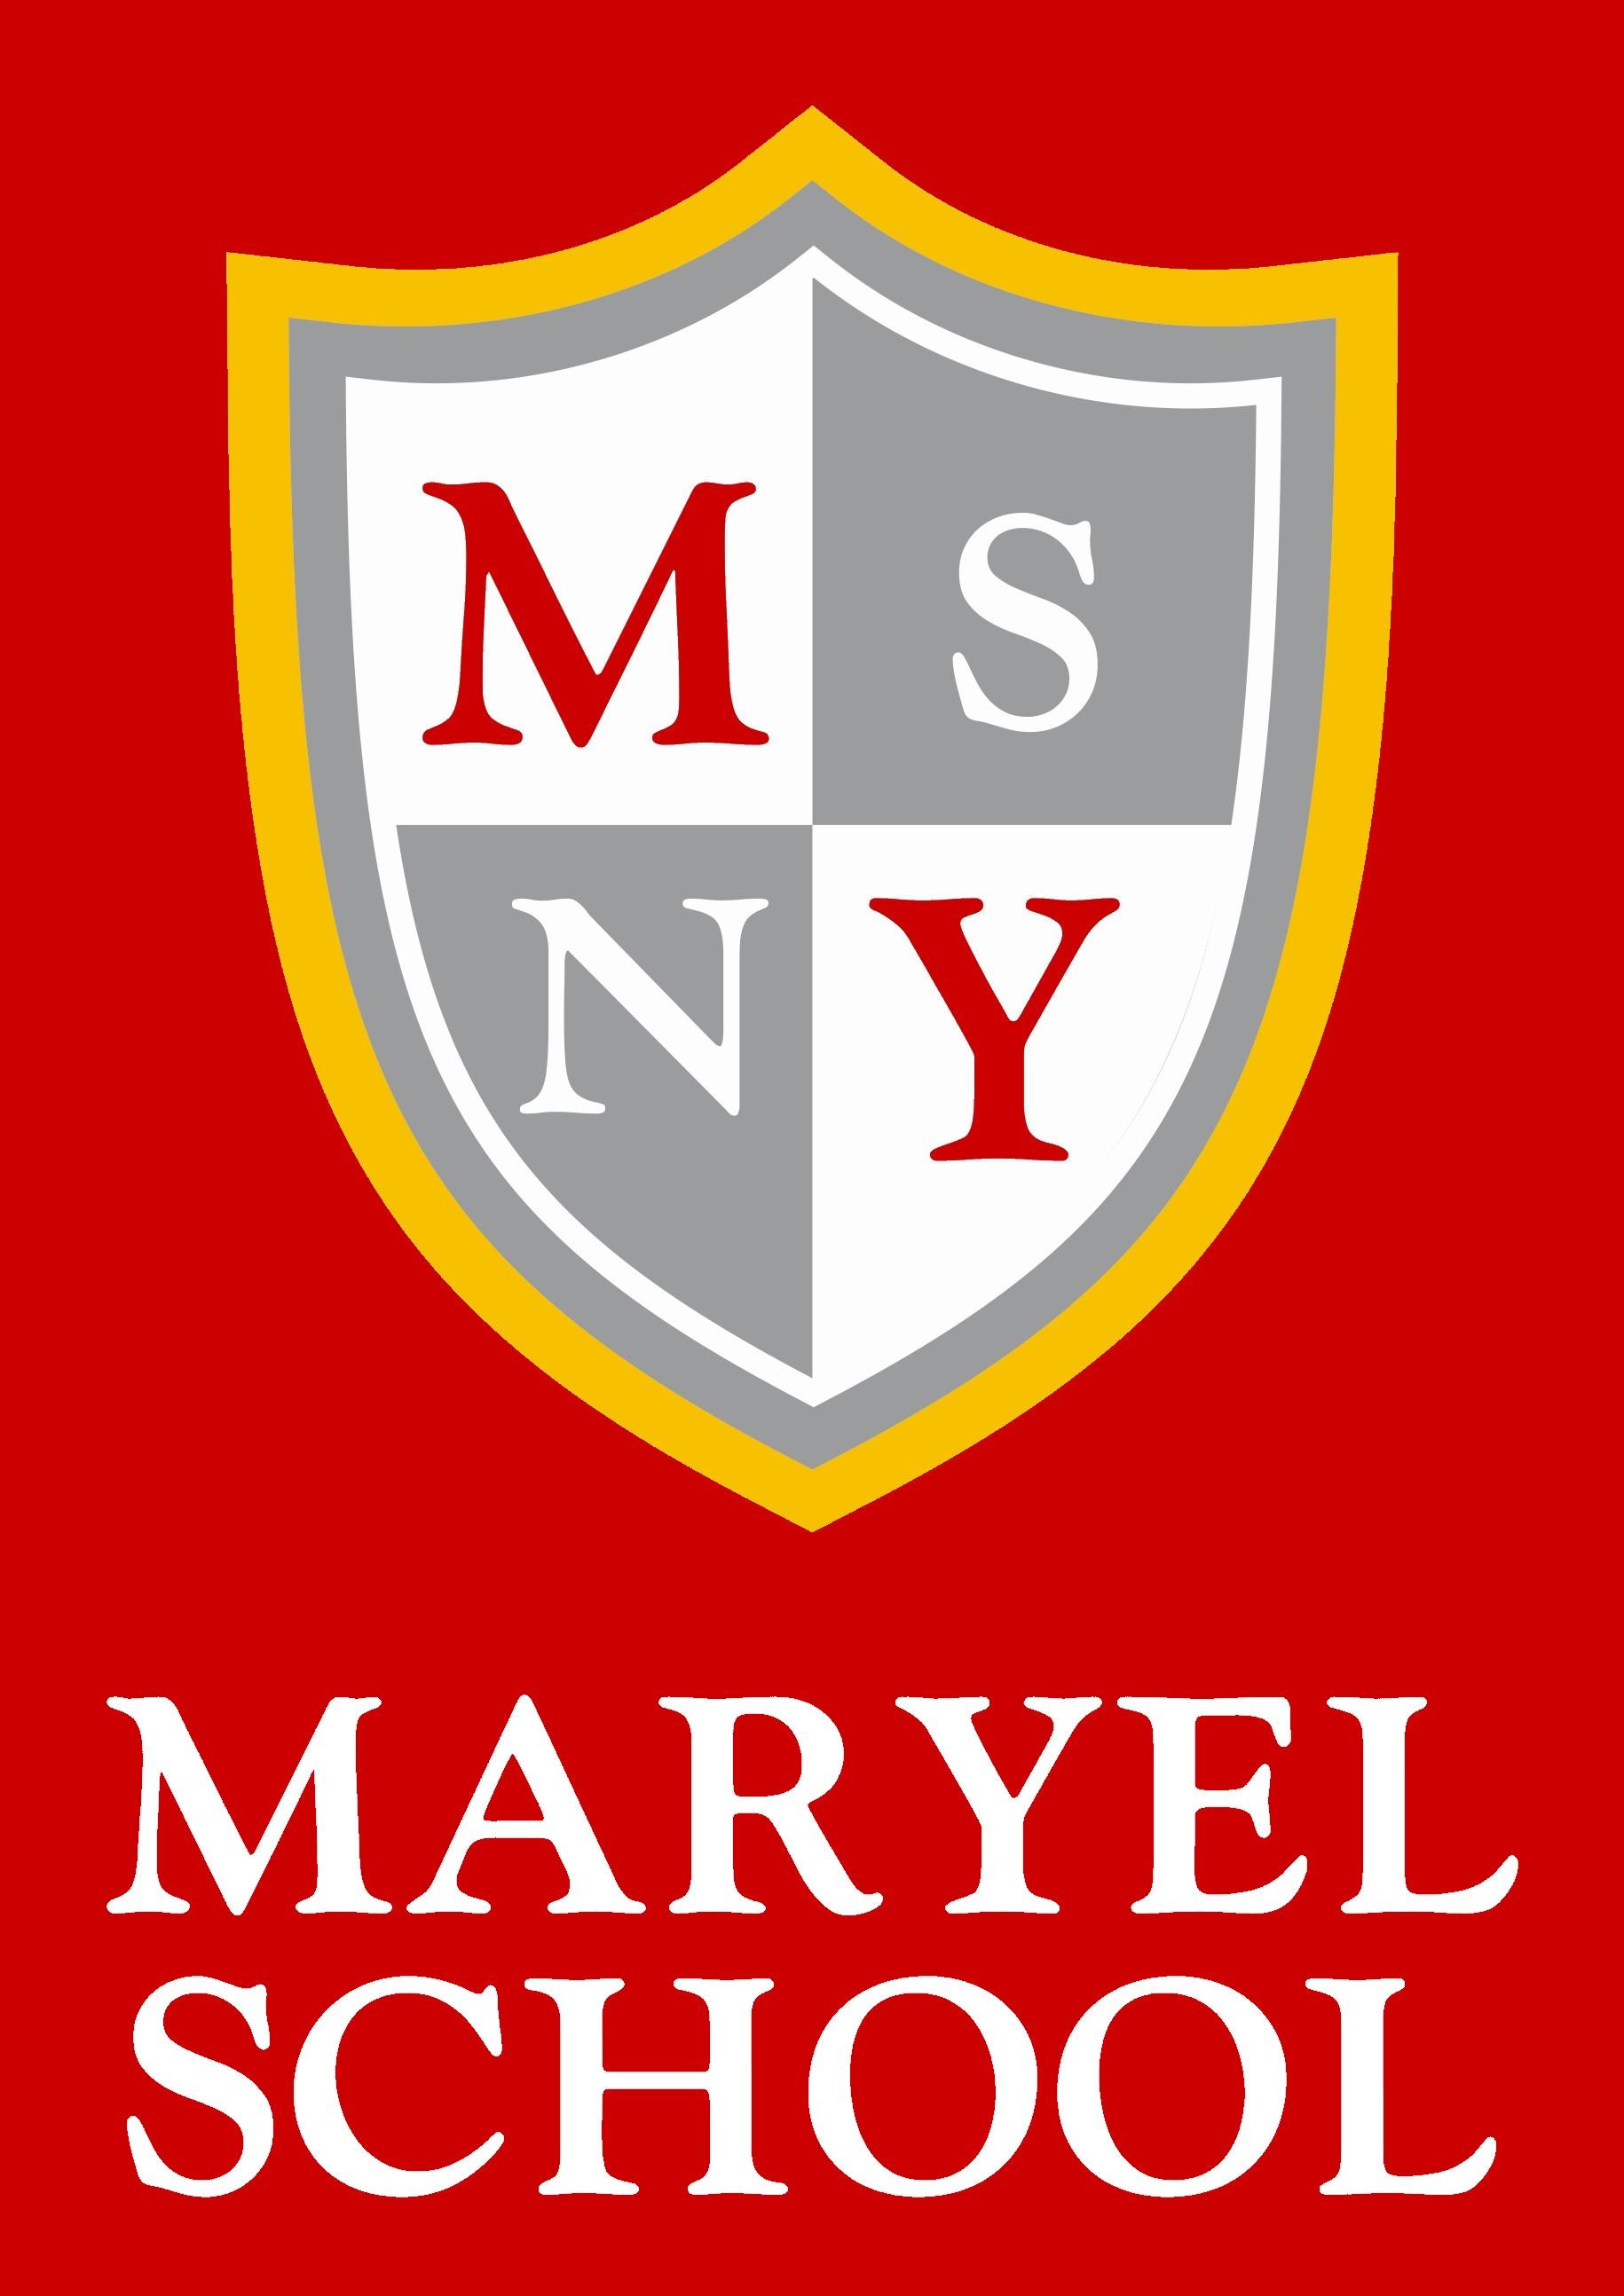 Maryel School of New York - school  | Photo 10 of 10 | Address: 28 E 35th St, New York, NY 10016, USA | Phone: (212) 213-2097